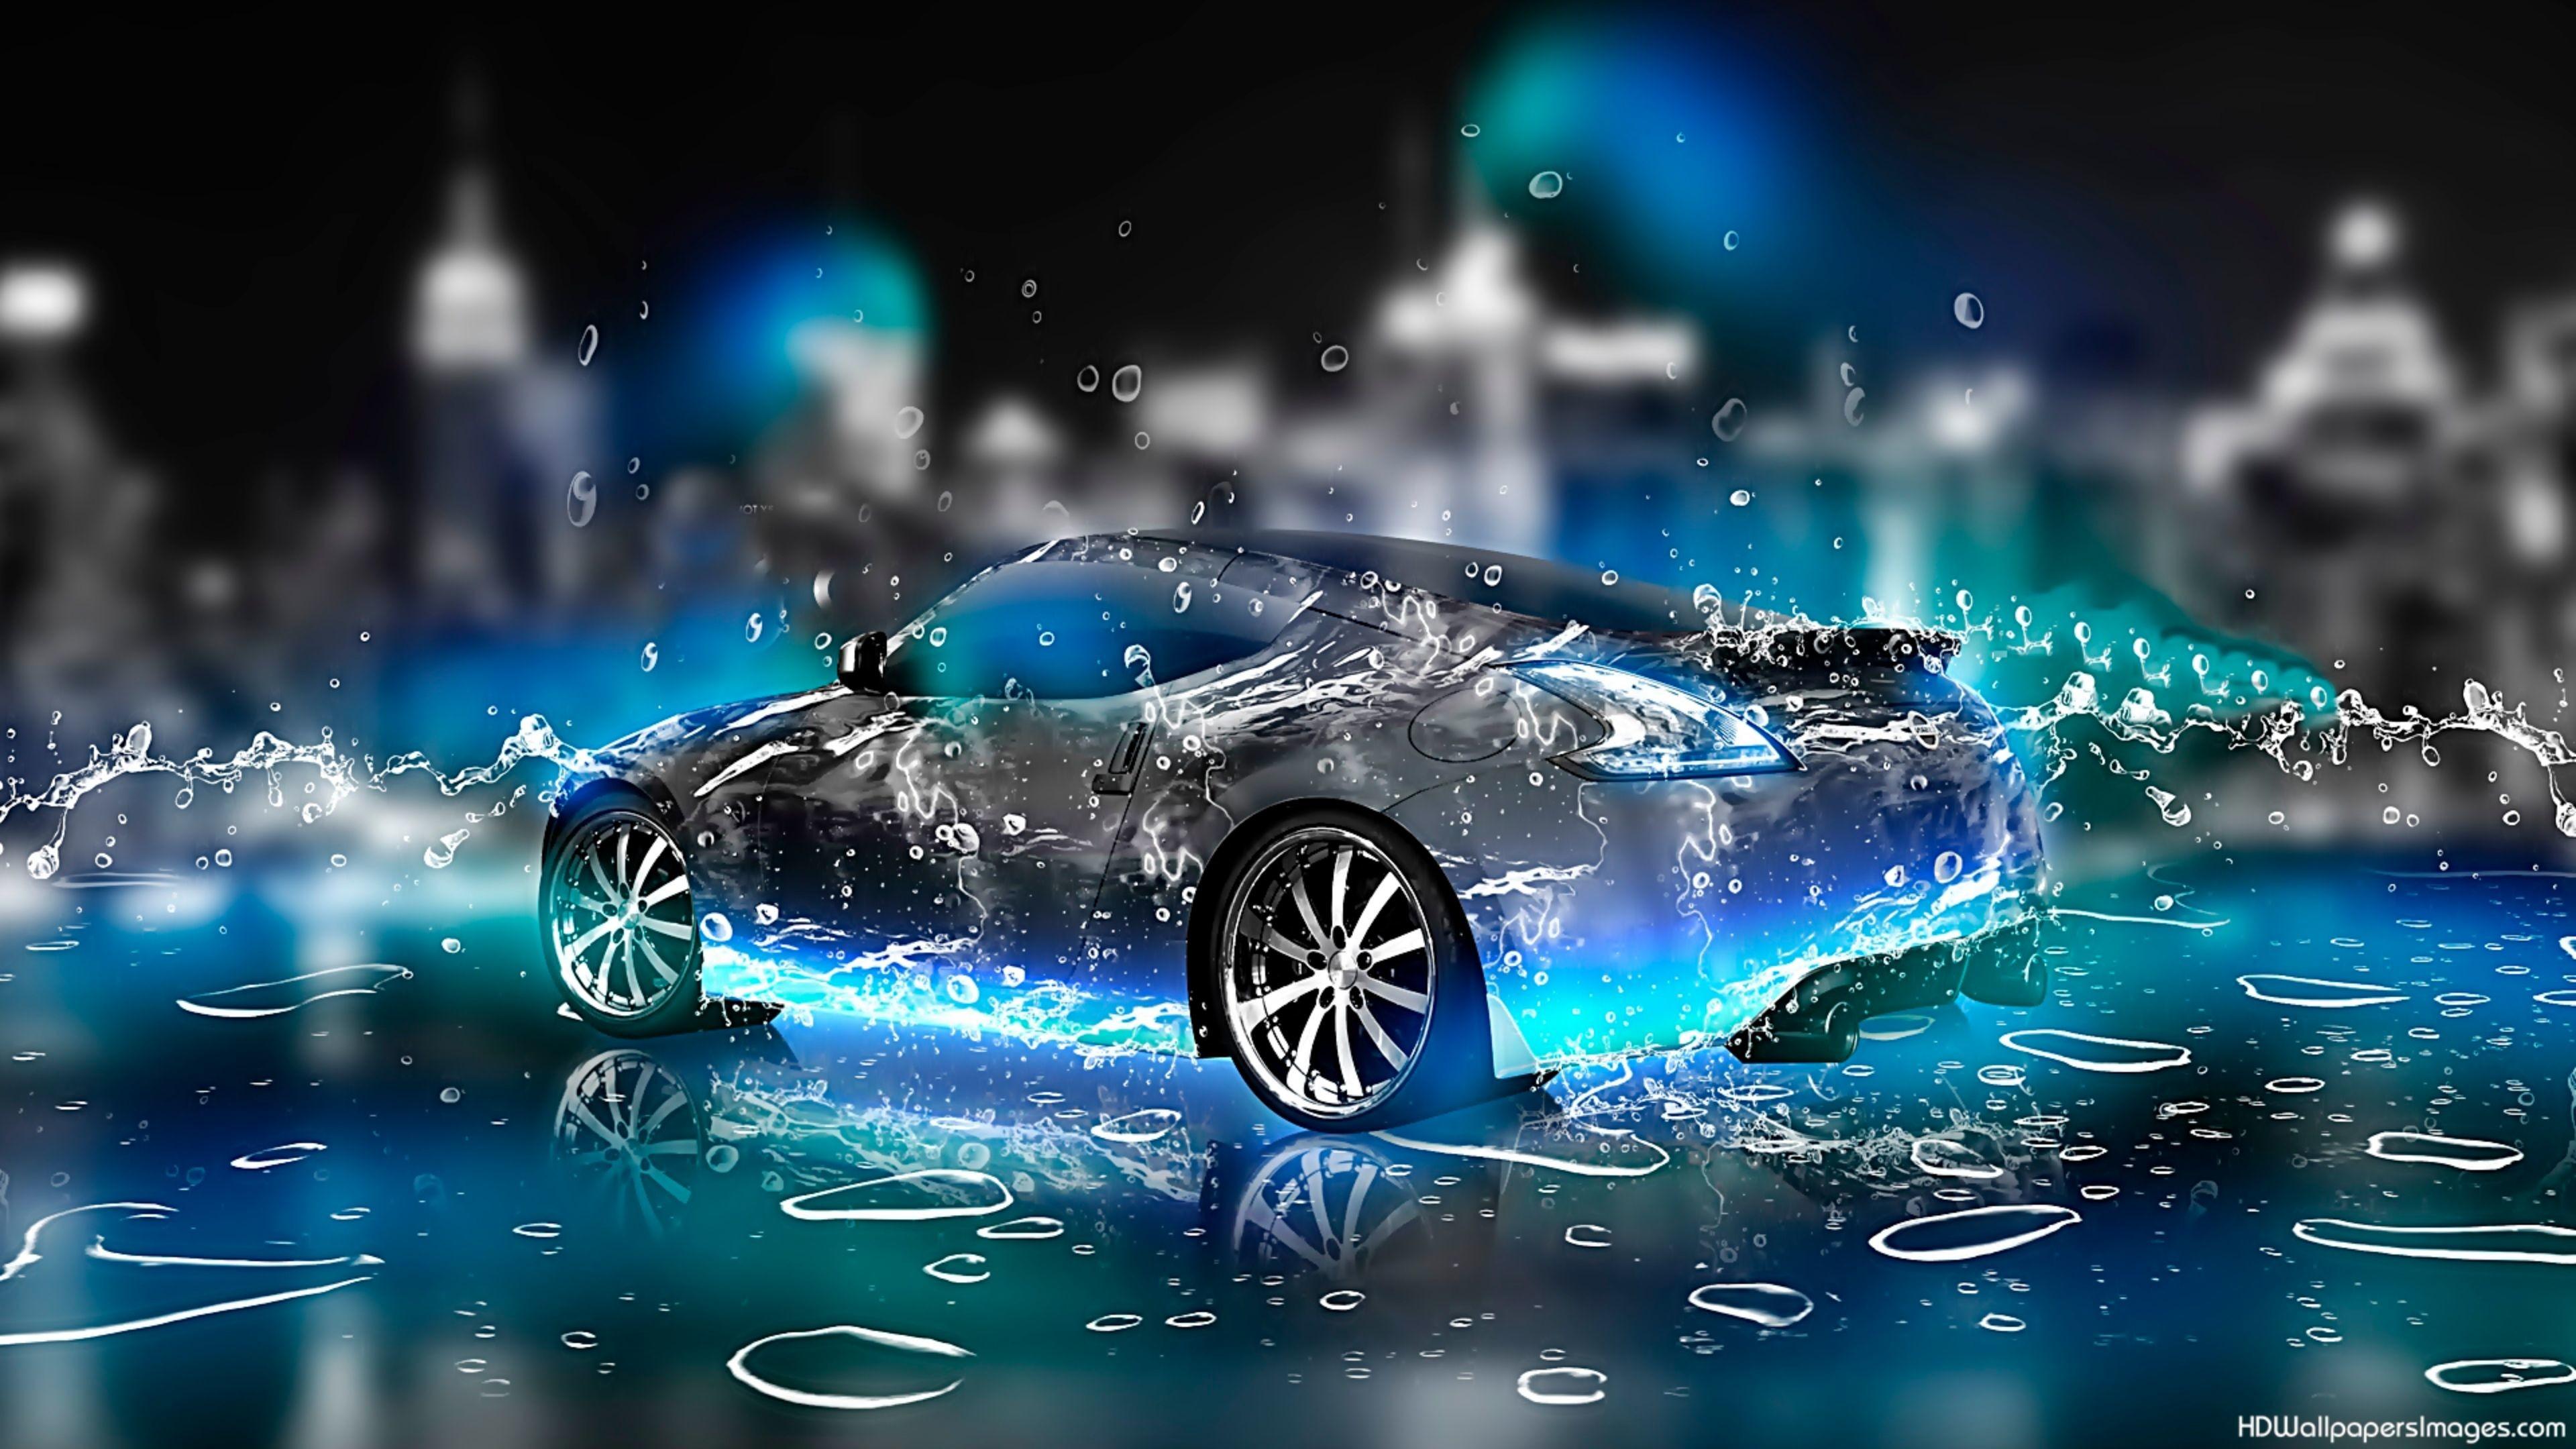 Wallpapers Wallpaper 4k Cool Car 3D 4K | Free Computer Backgrounds Hd  wallpaper …